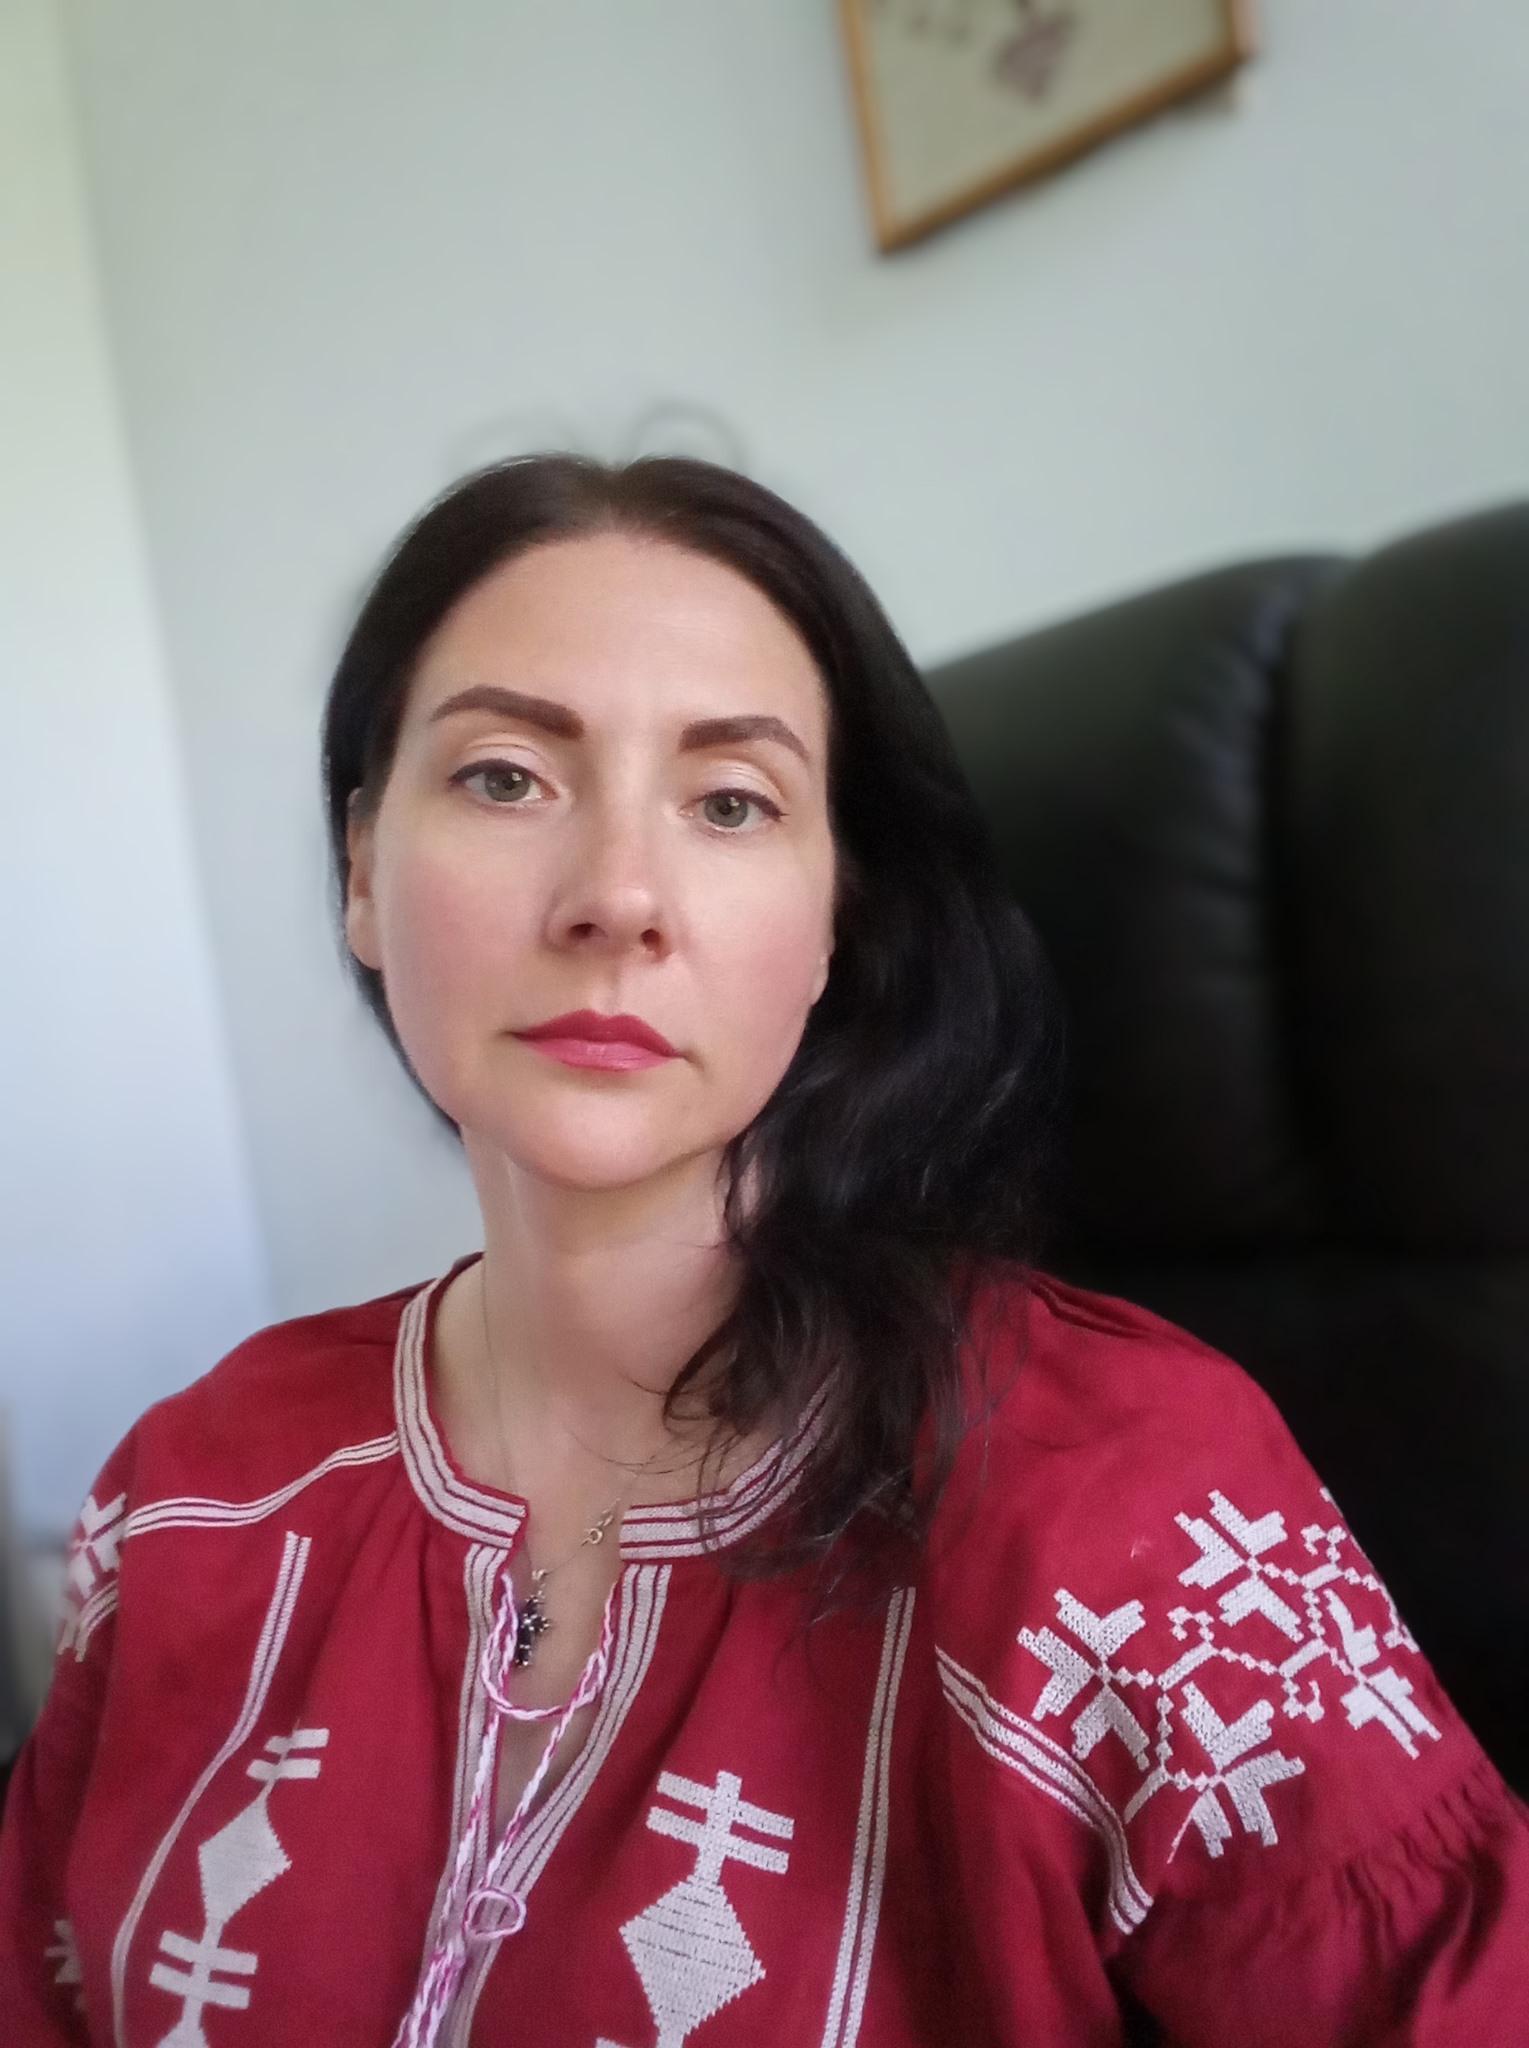 Людмила Шумкова, жена пленника.